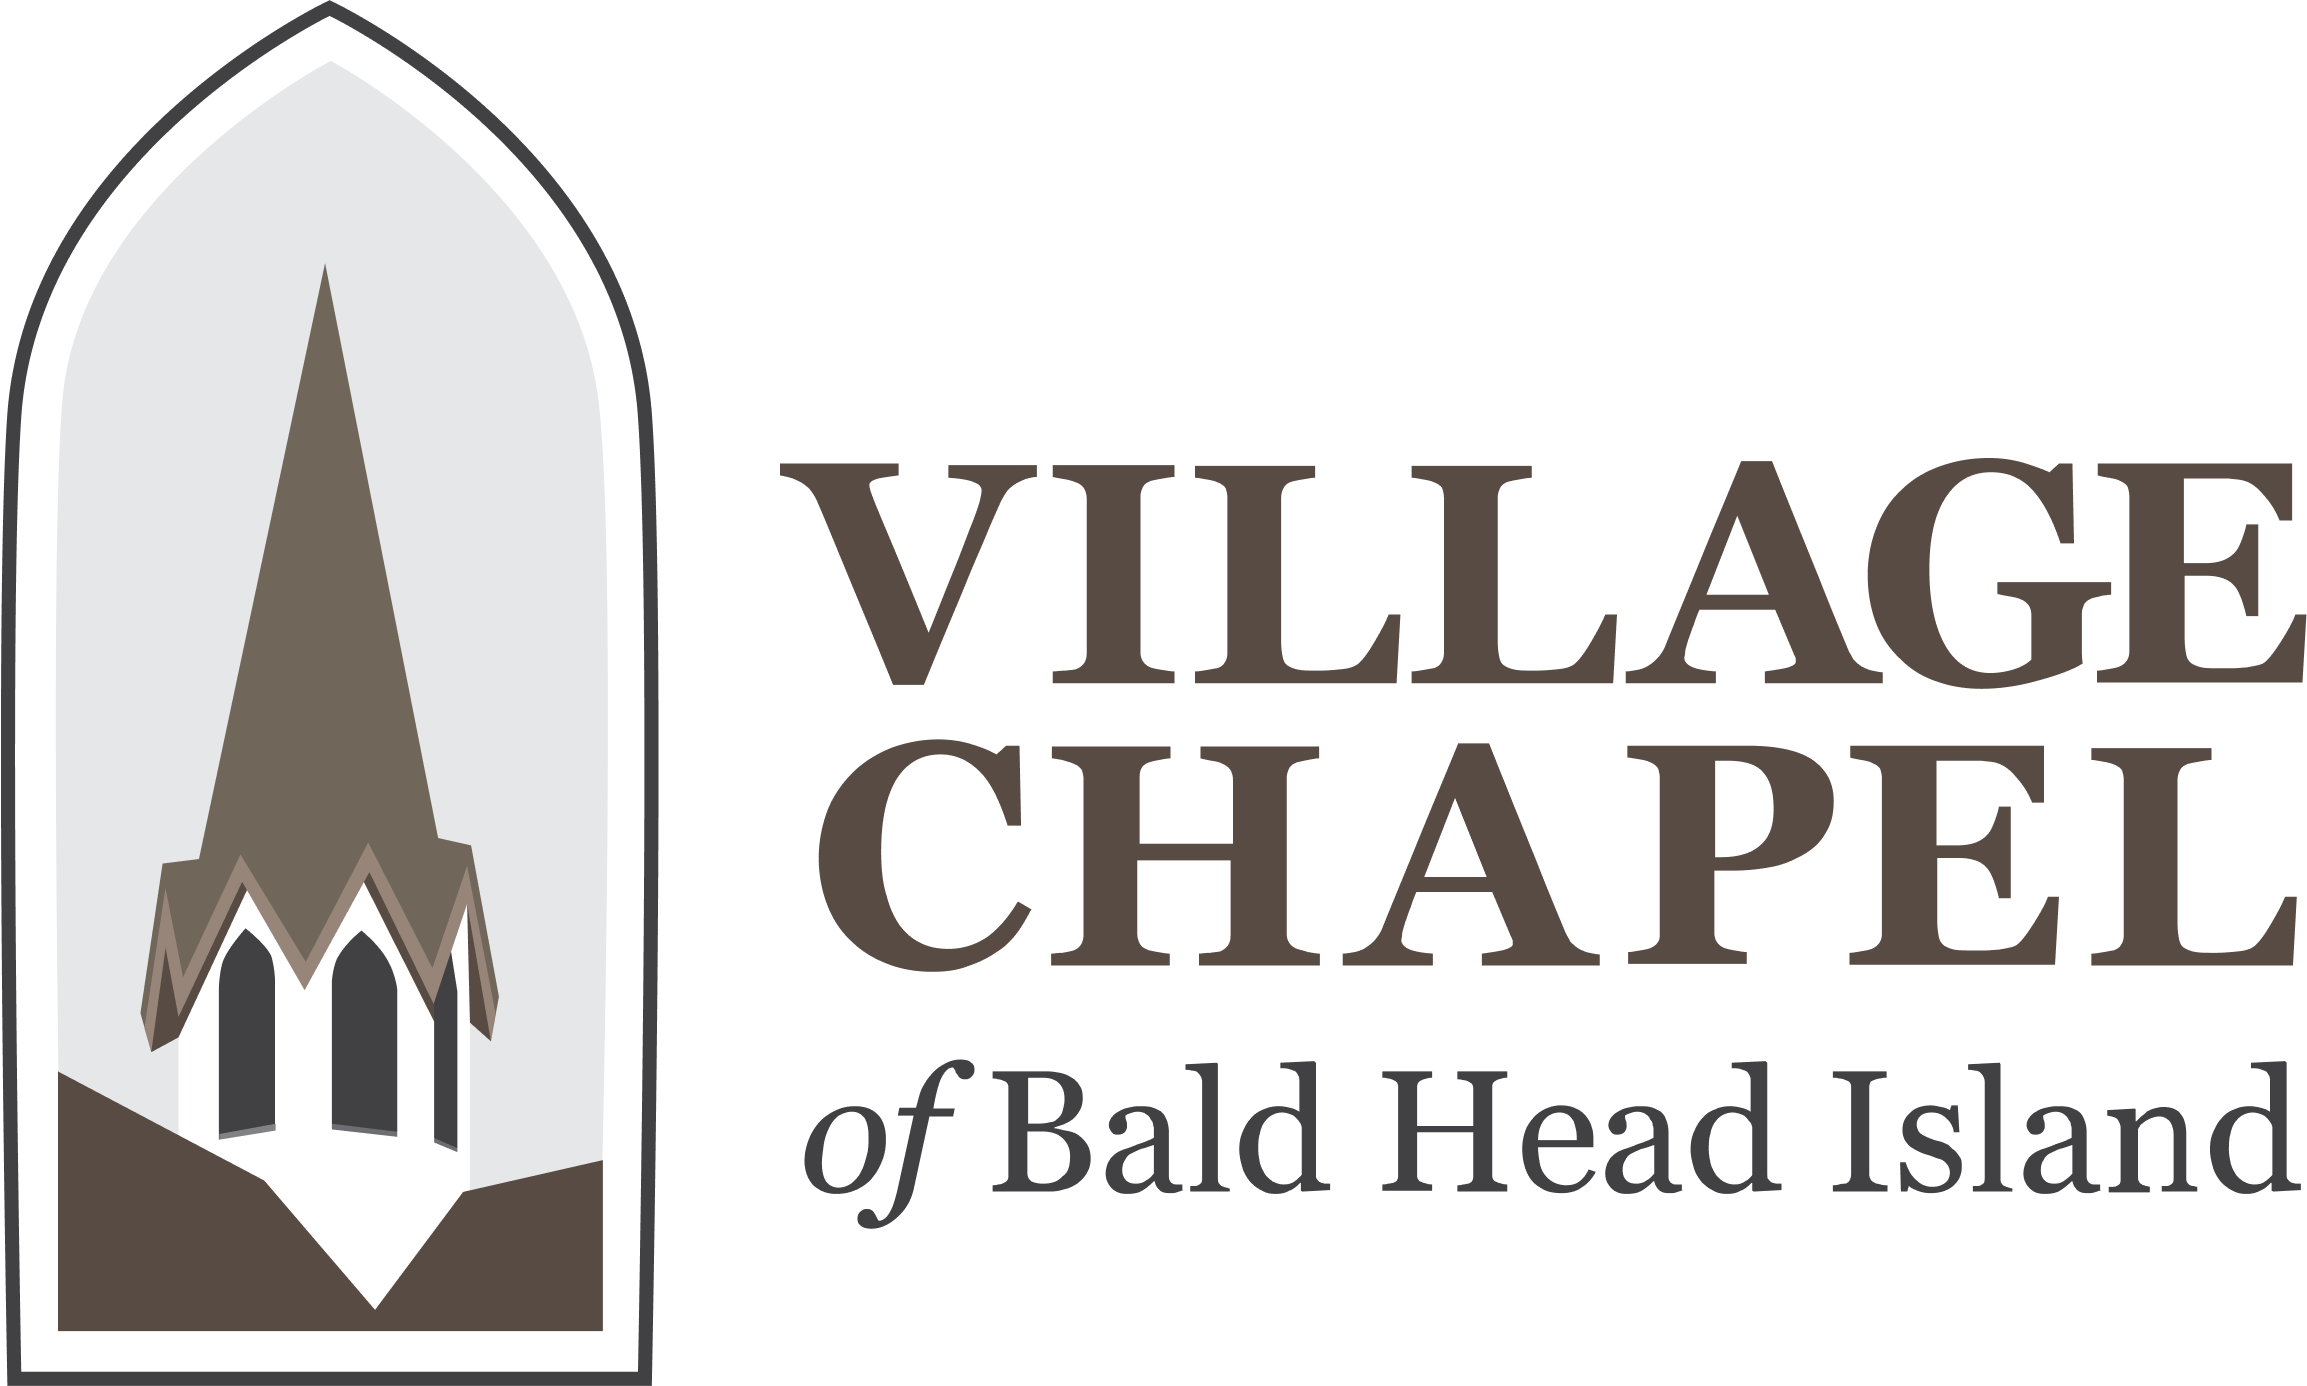 Village Chapel of Bald Head Island